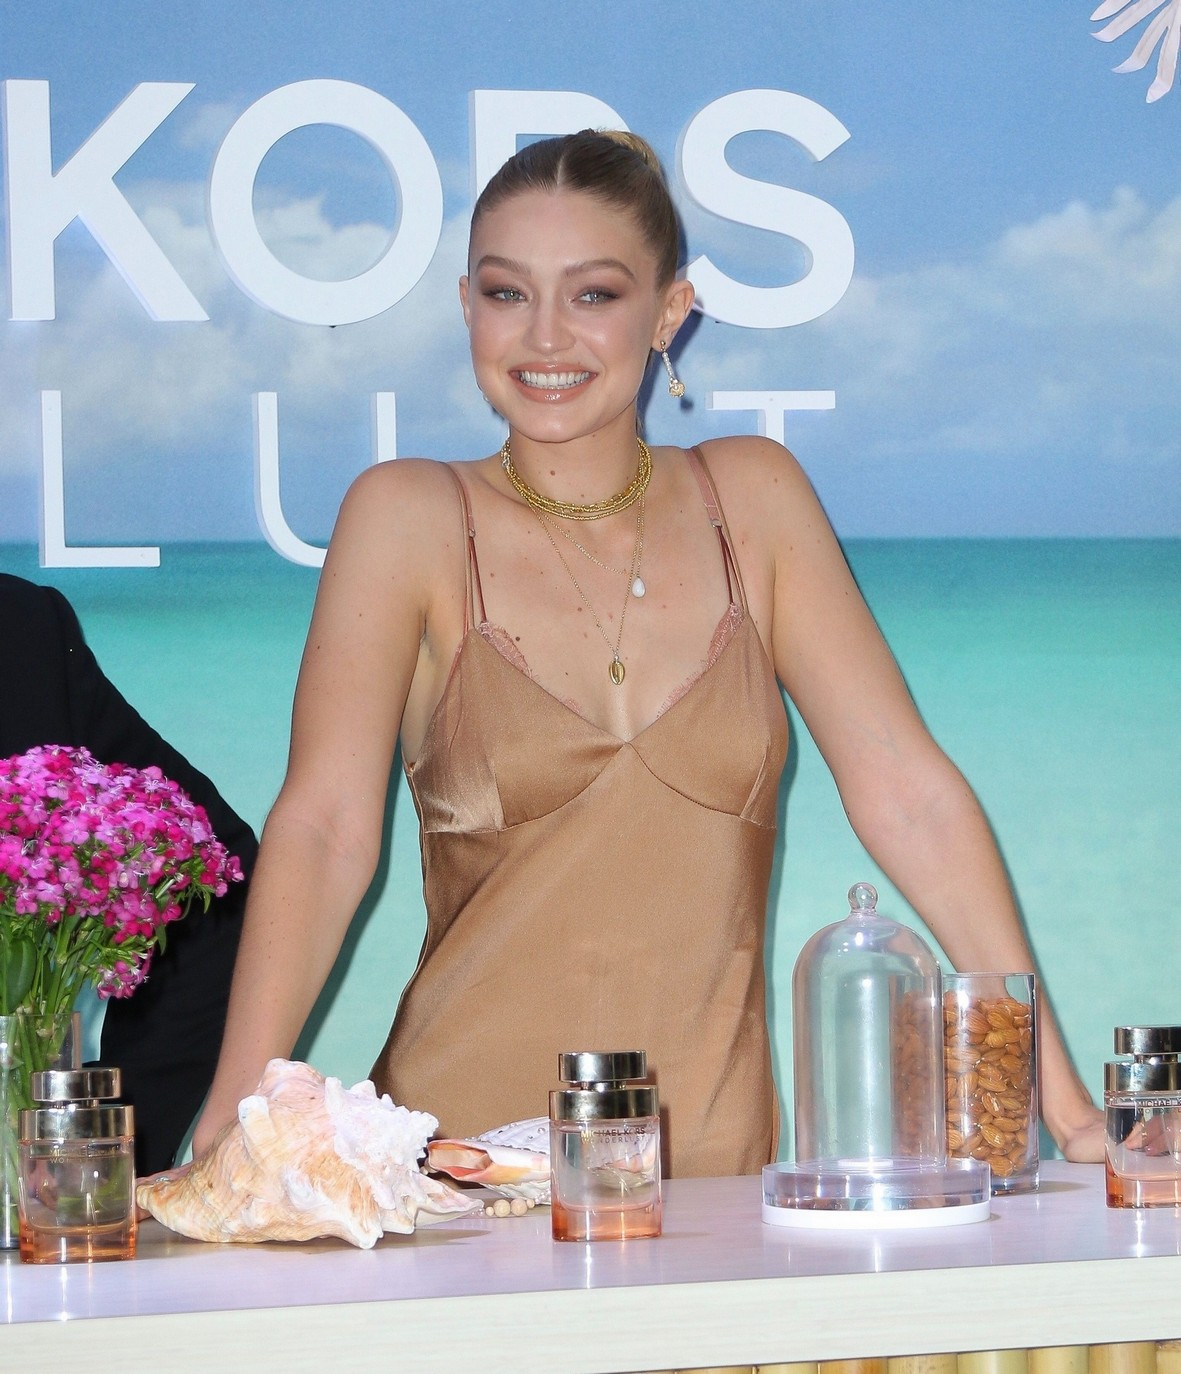 Gigi Hadid Sexy at Michael Kor's Wonderlust Fragrance Campaign launch